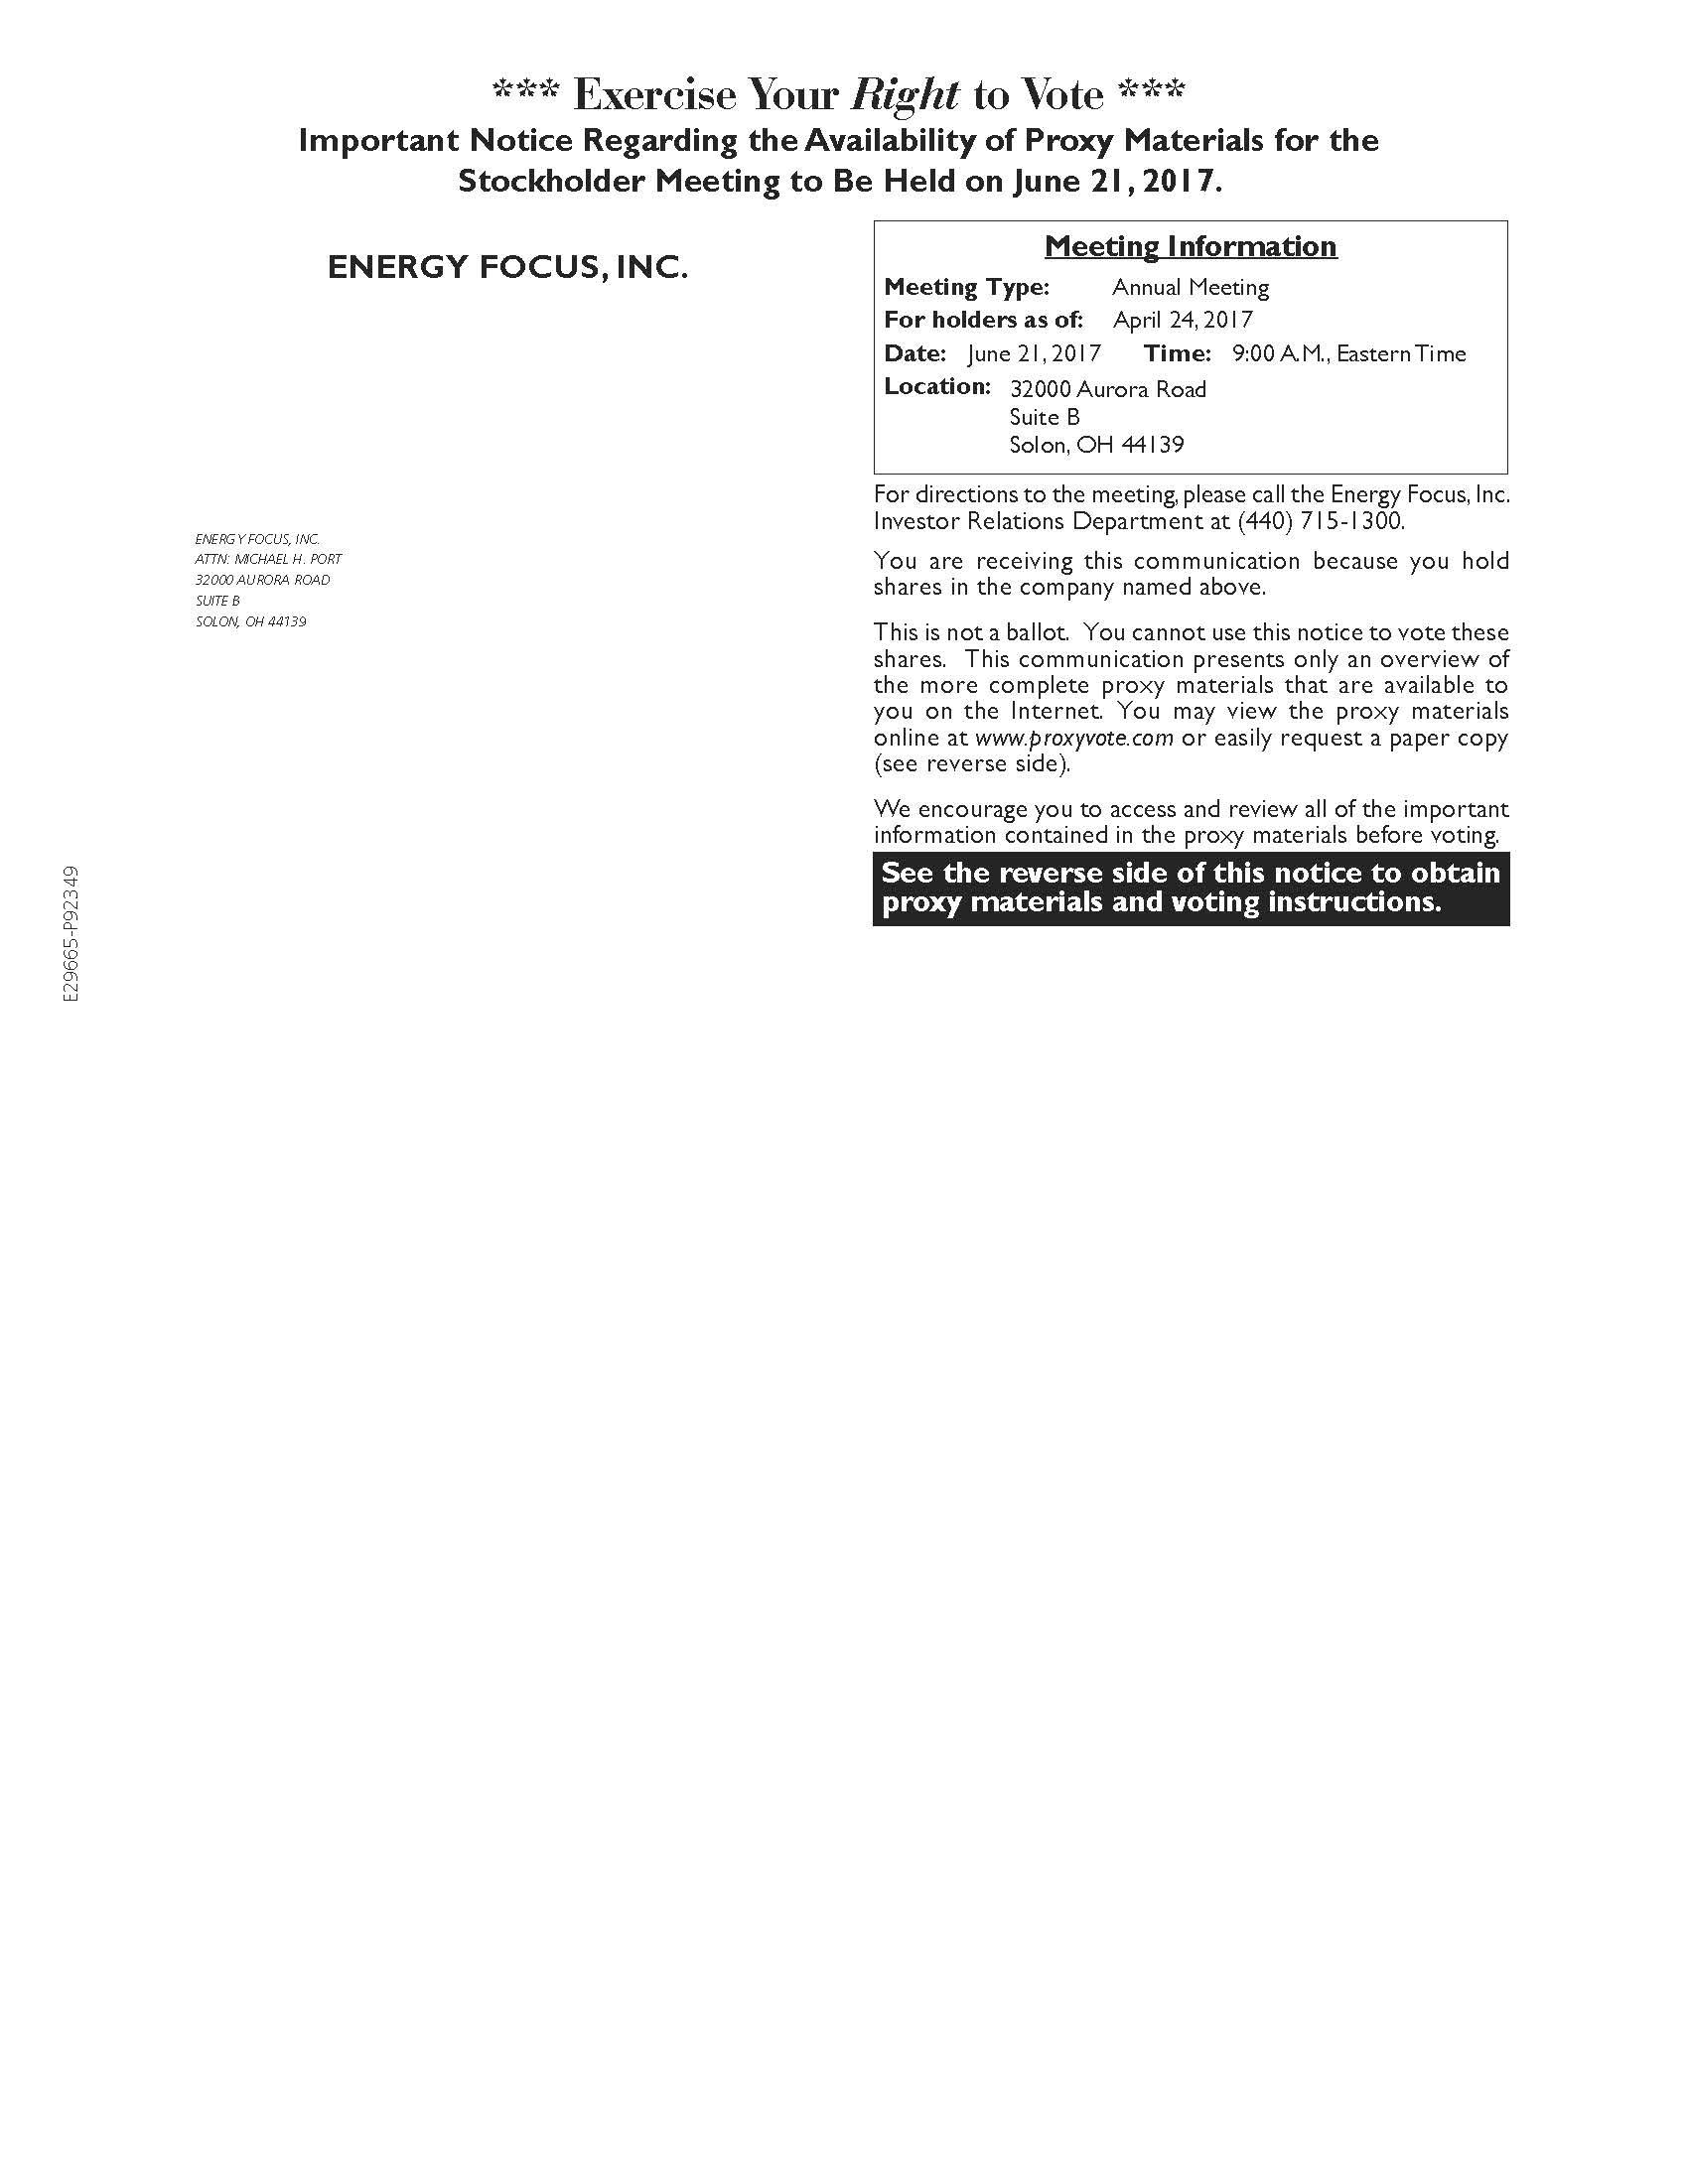 A2017EFOINOTICEACCESSCARDFIN.JPG